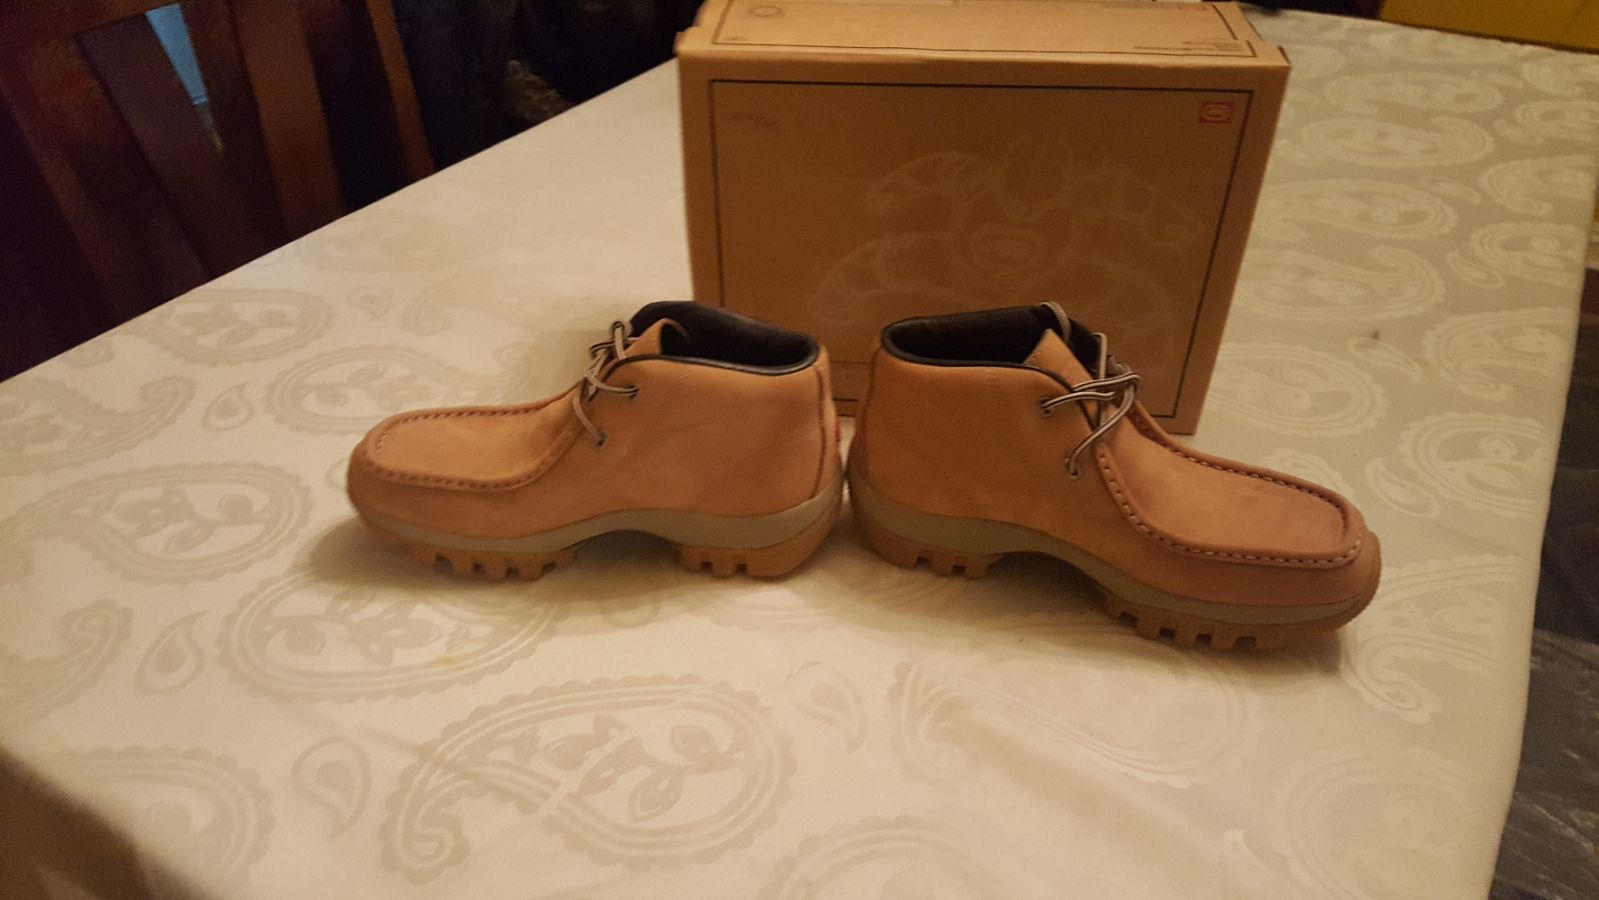 Mark Echo boots